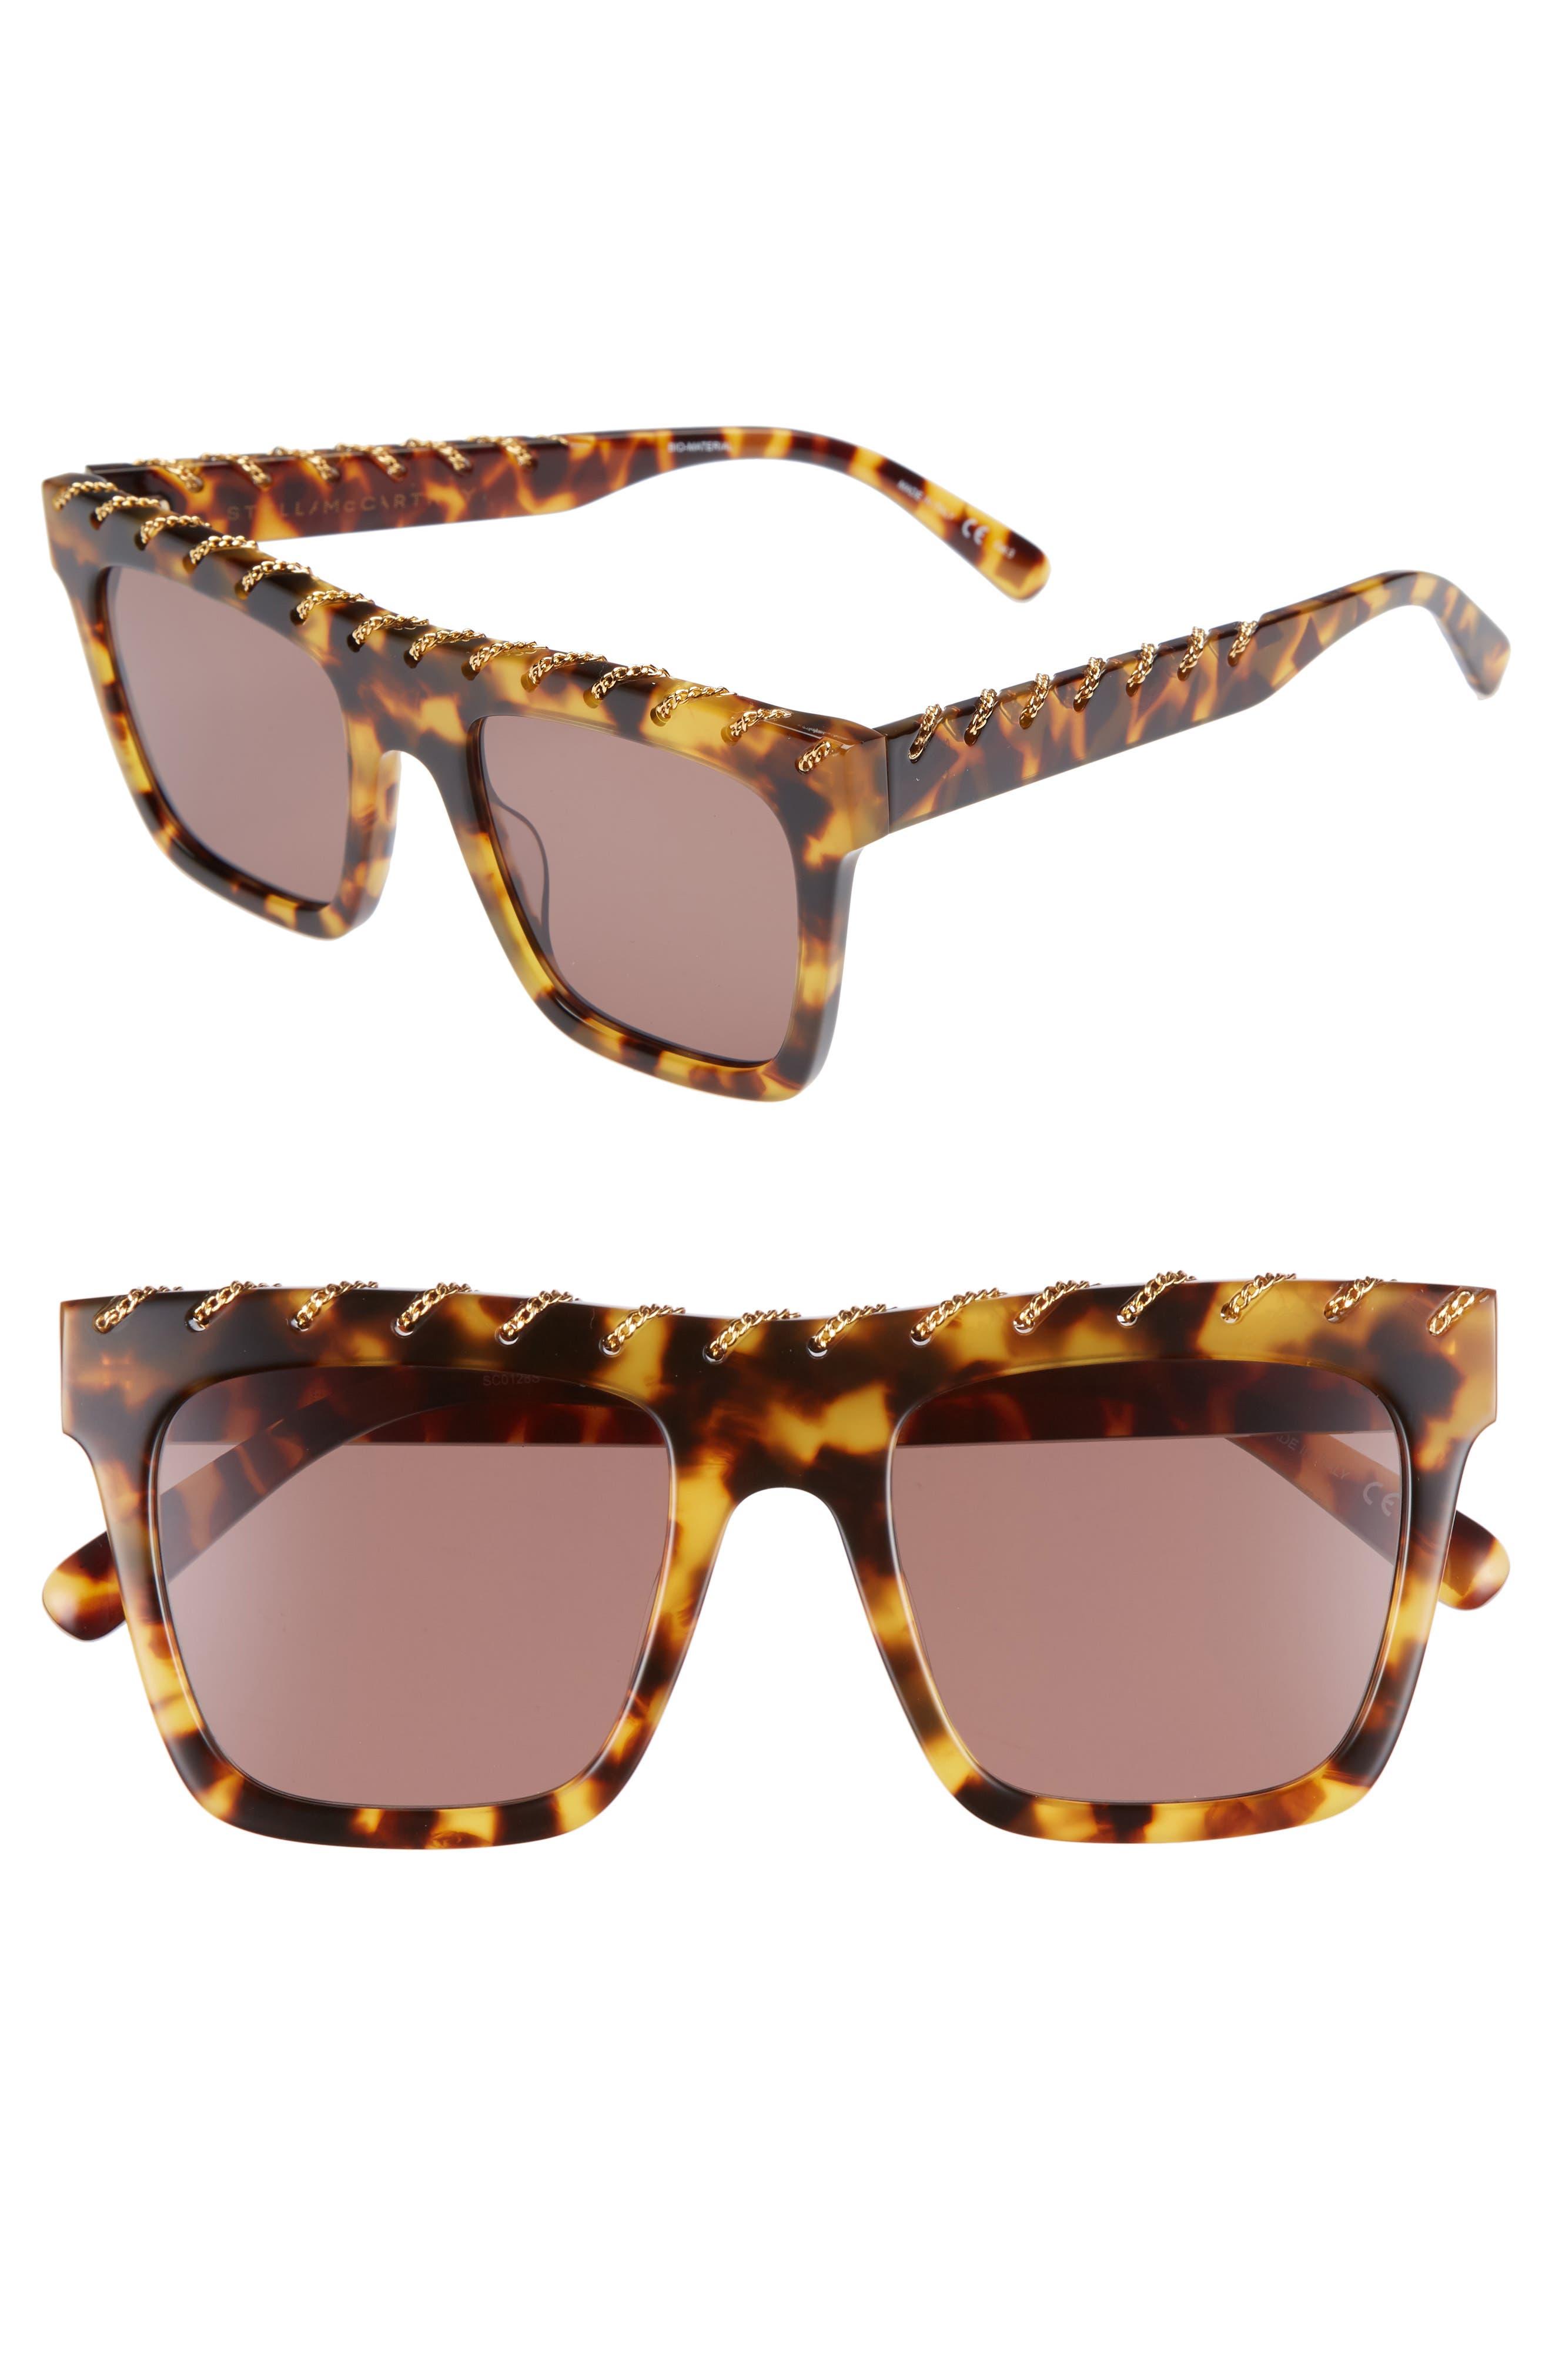 51mm Chain Detail Square Sunglasses,                             Main thumbnail 1, color,                             212